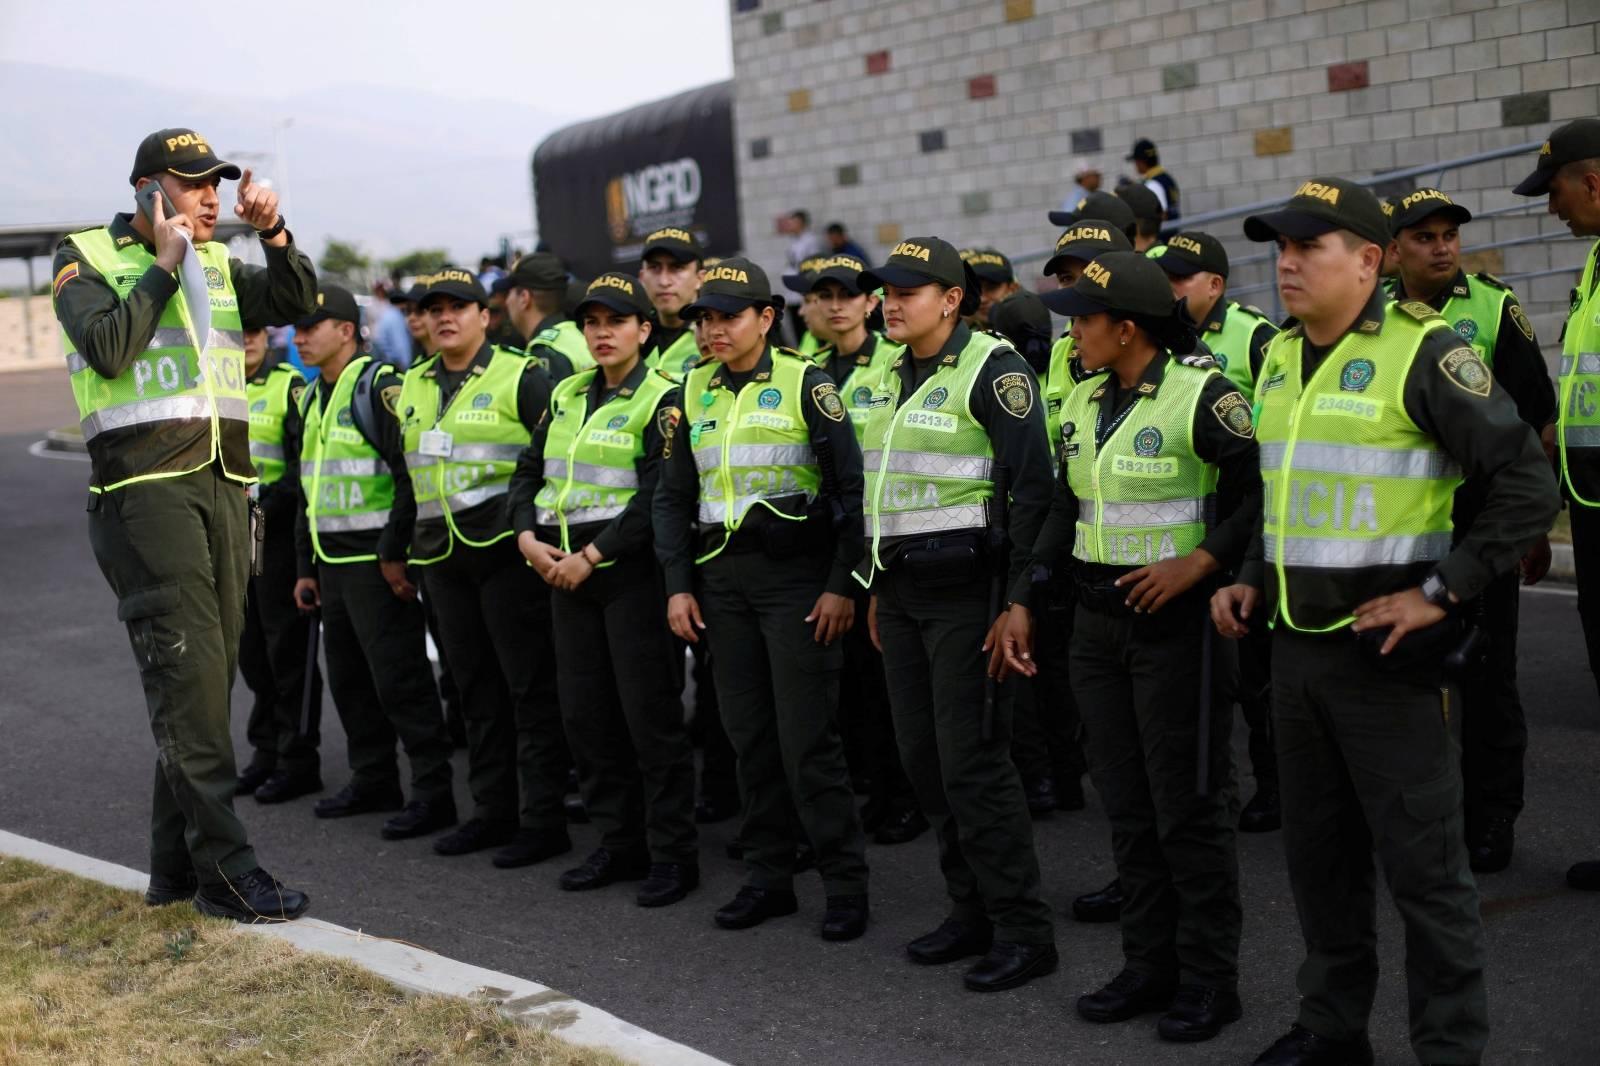 Colombian police officers arrive to the Tienditas cross-border bridge between Colombia and Venezuela in Cucuta